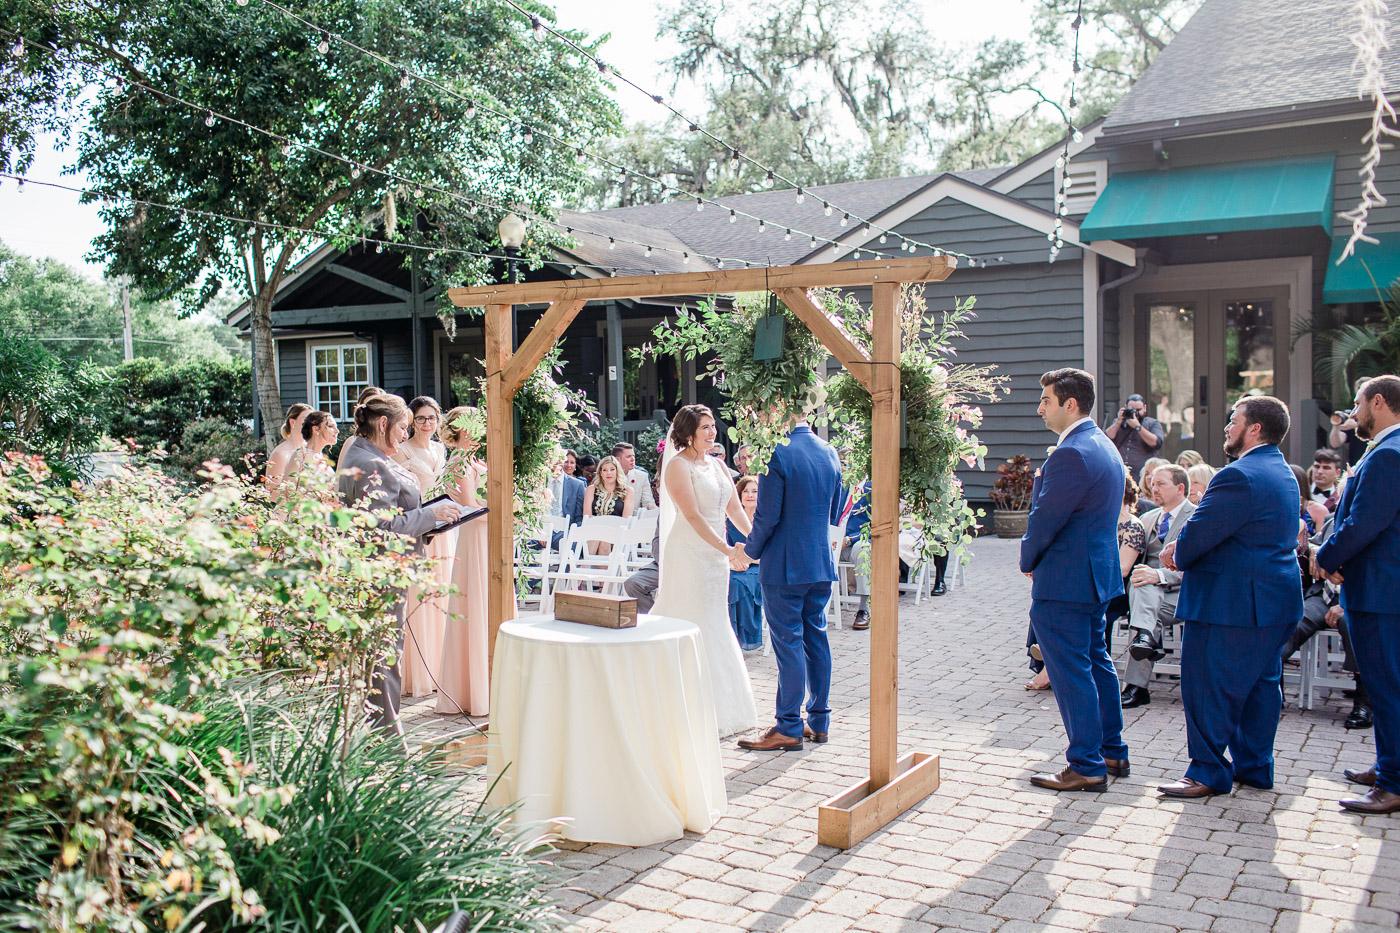 hstoric-dubsdread-wedding-orlando-14.jpg